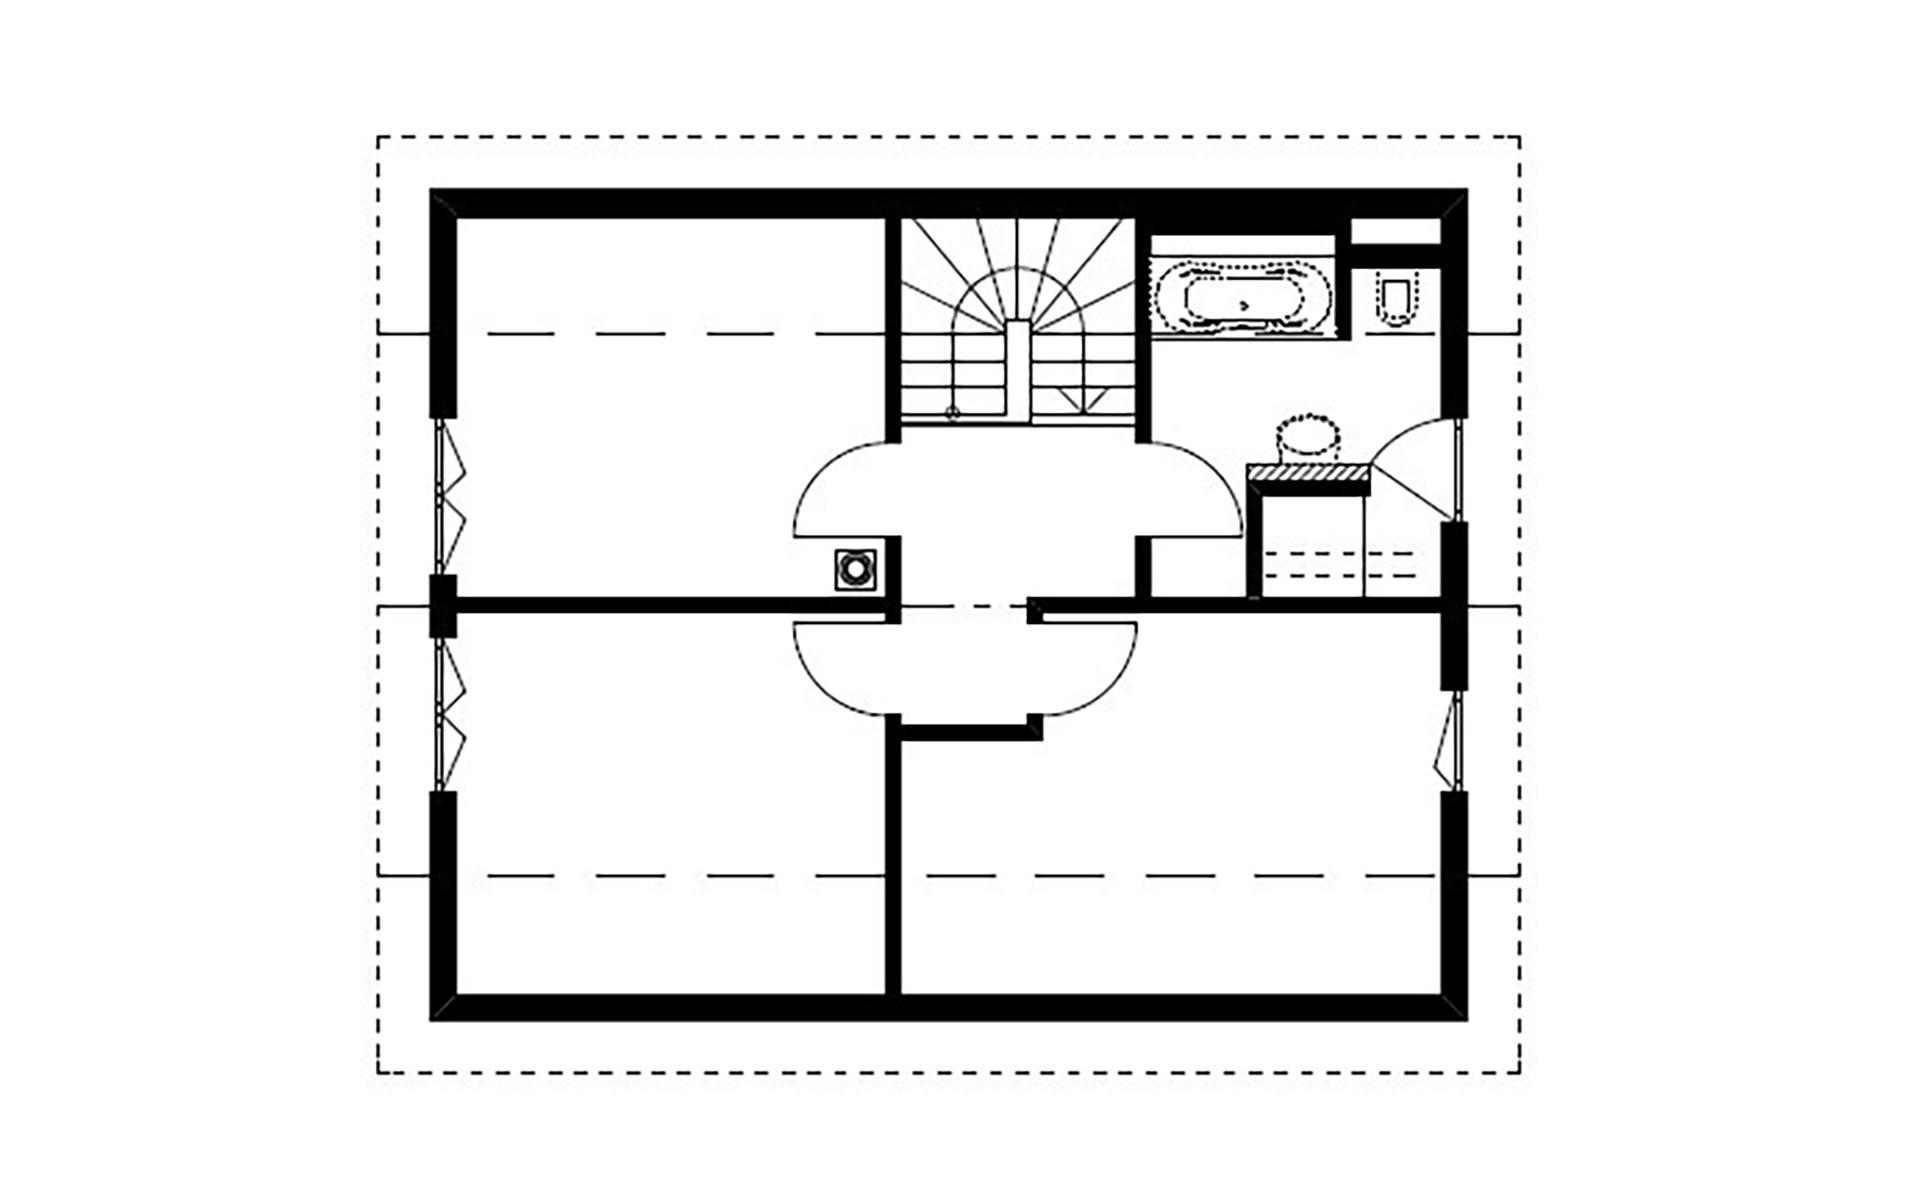 Dachgeschoss Homestory 785 von Lehner-Haus GmbH